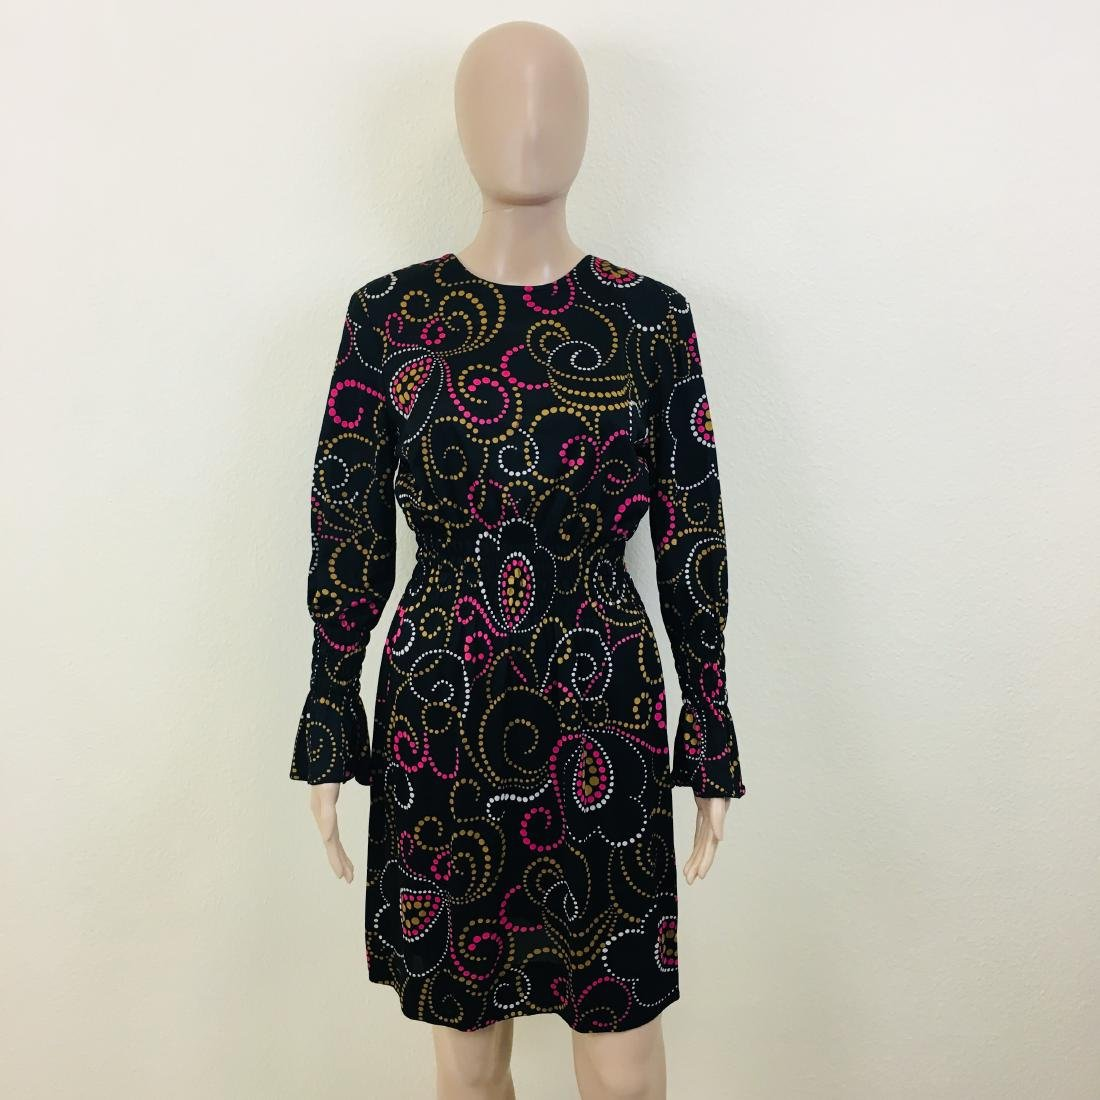 Vintage Women's Black Dress